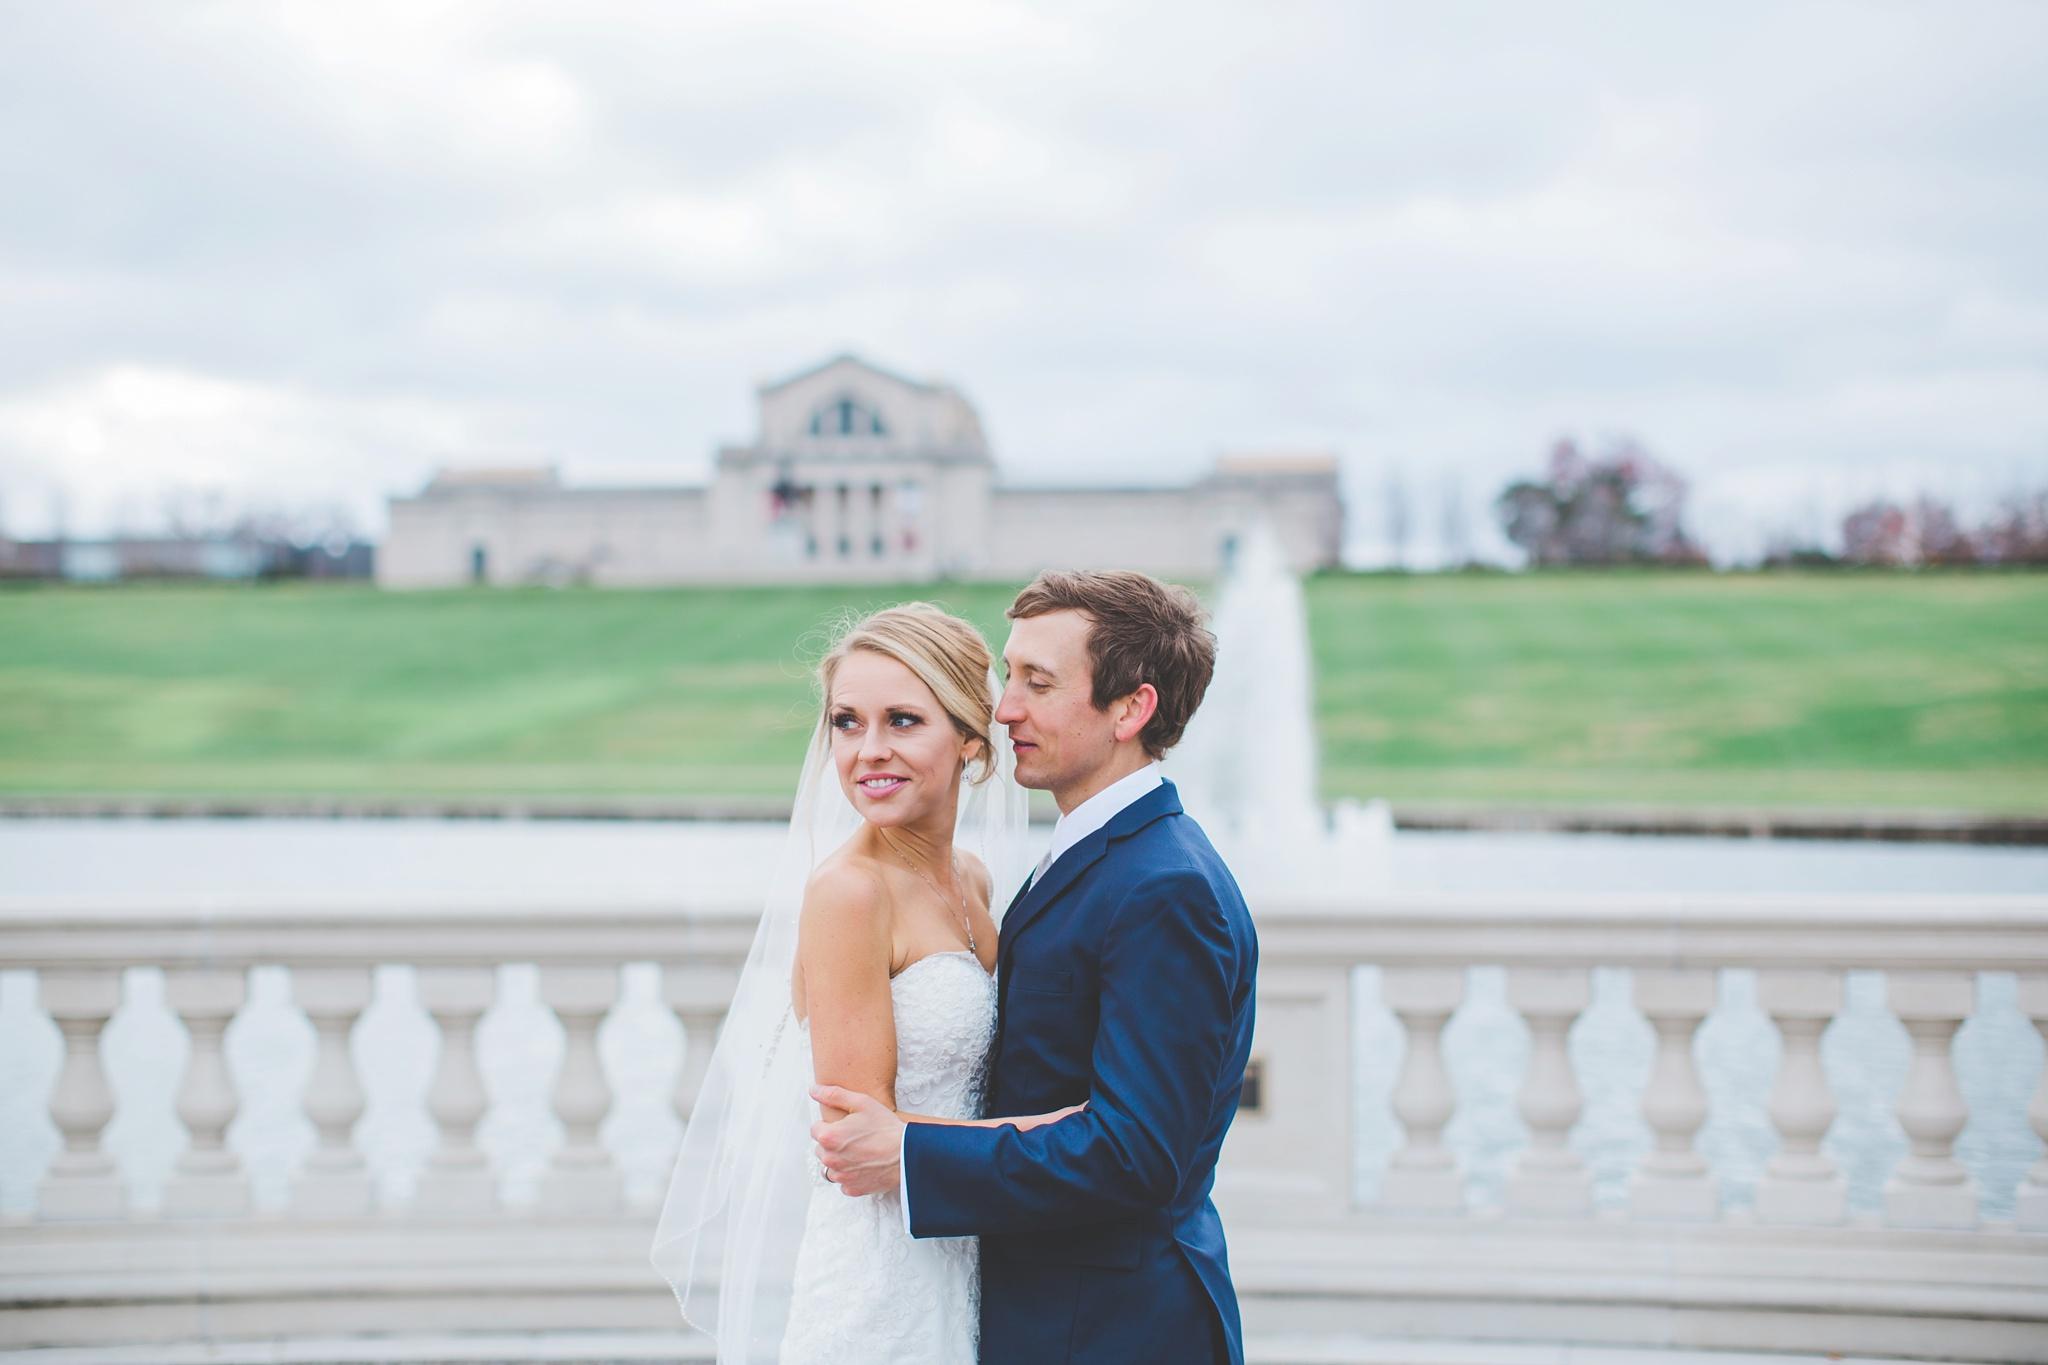 St. Louis Wedding Photographer   Chandler Rose Photography_0021.jpg